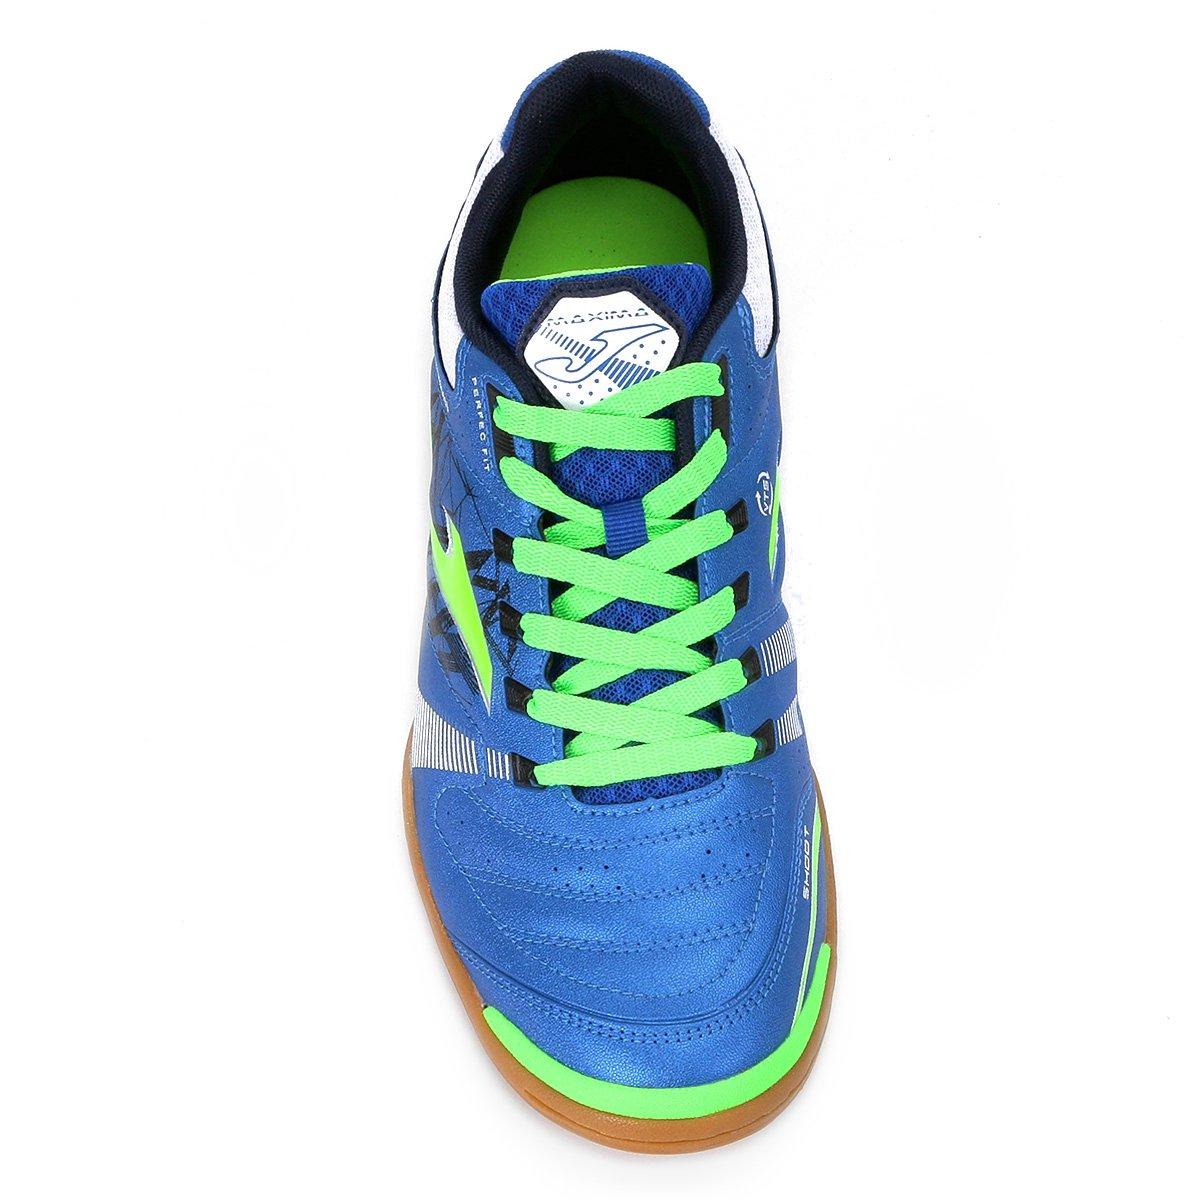 Chuteira Futsal Joma Maxima IN - Azul - Compre Agora  2322661c64105